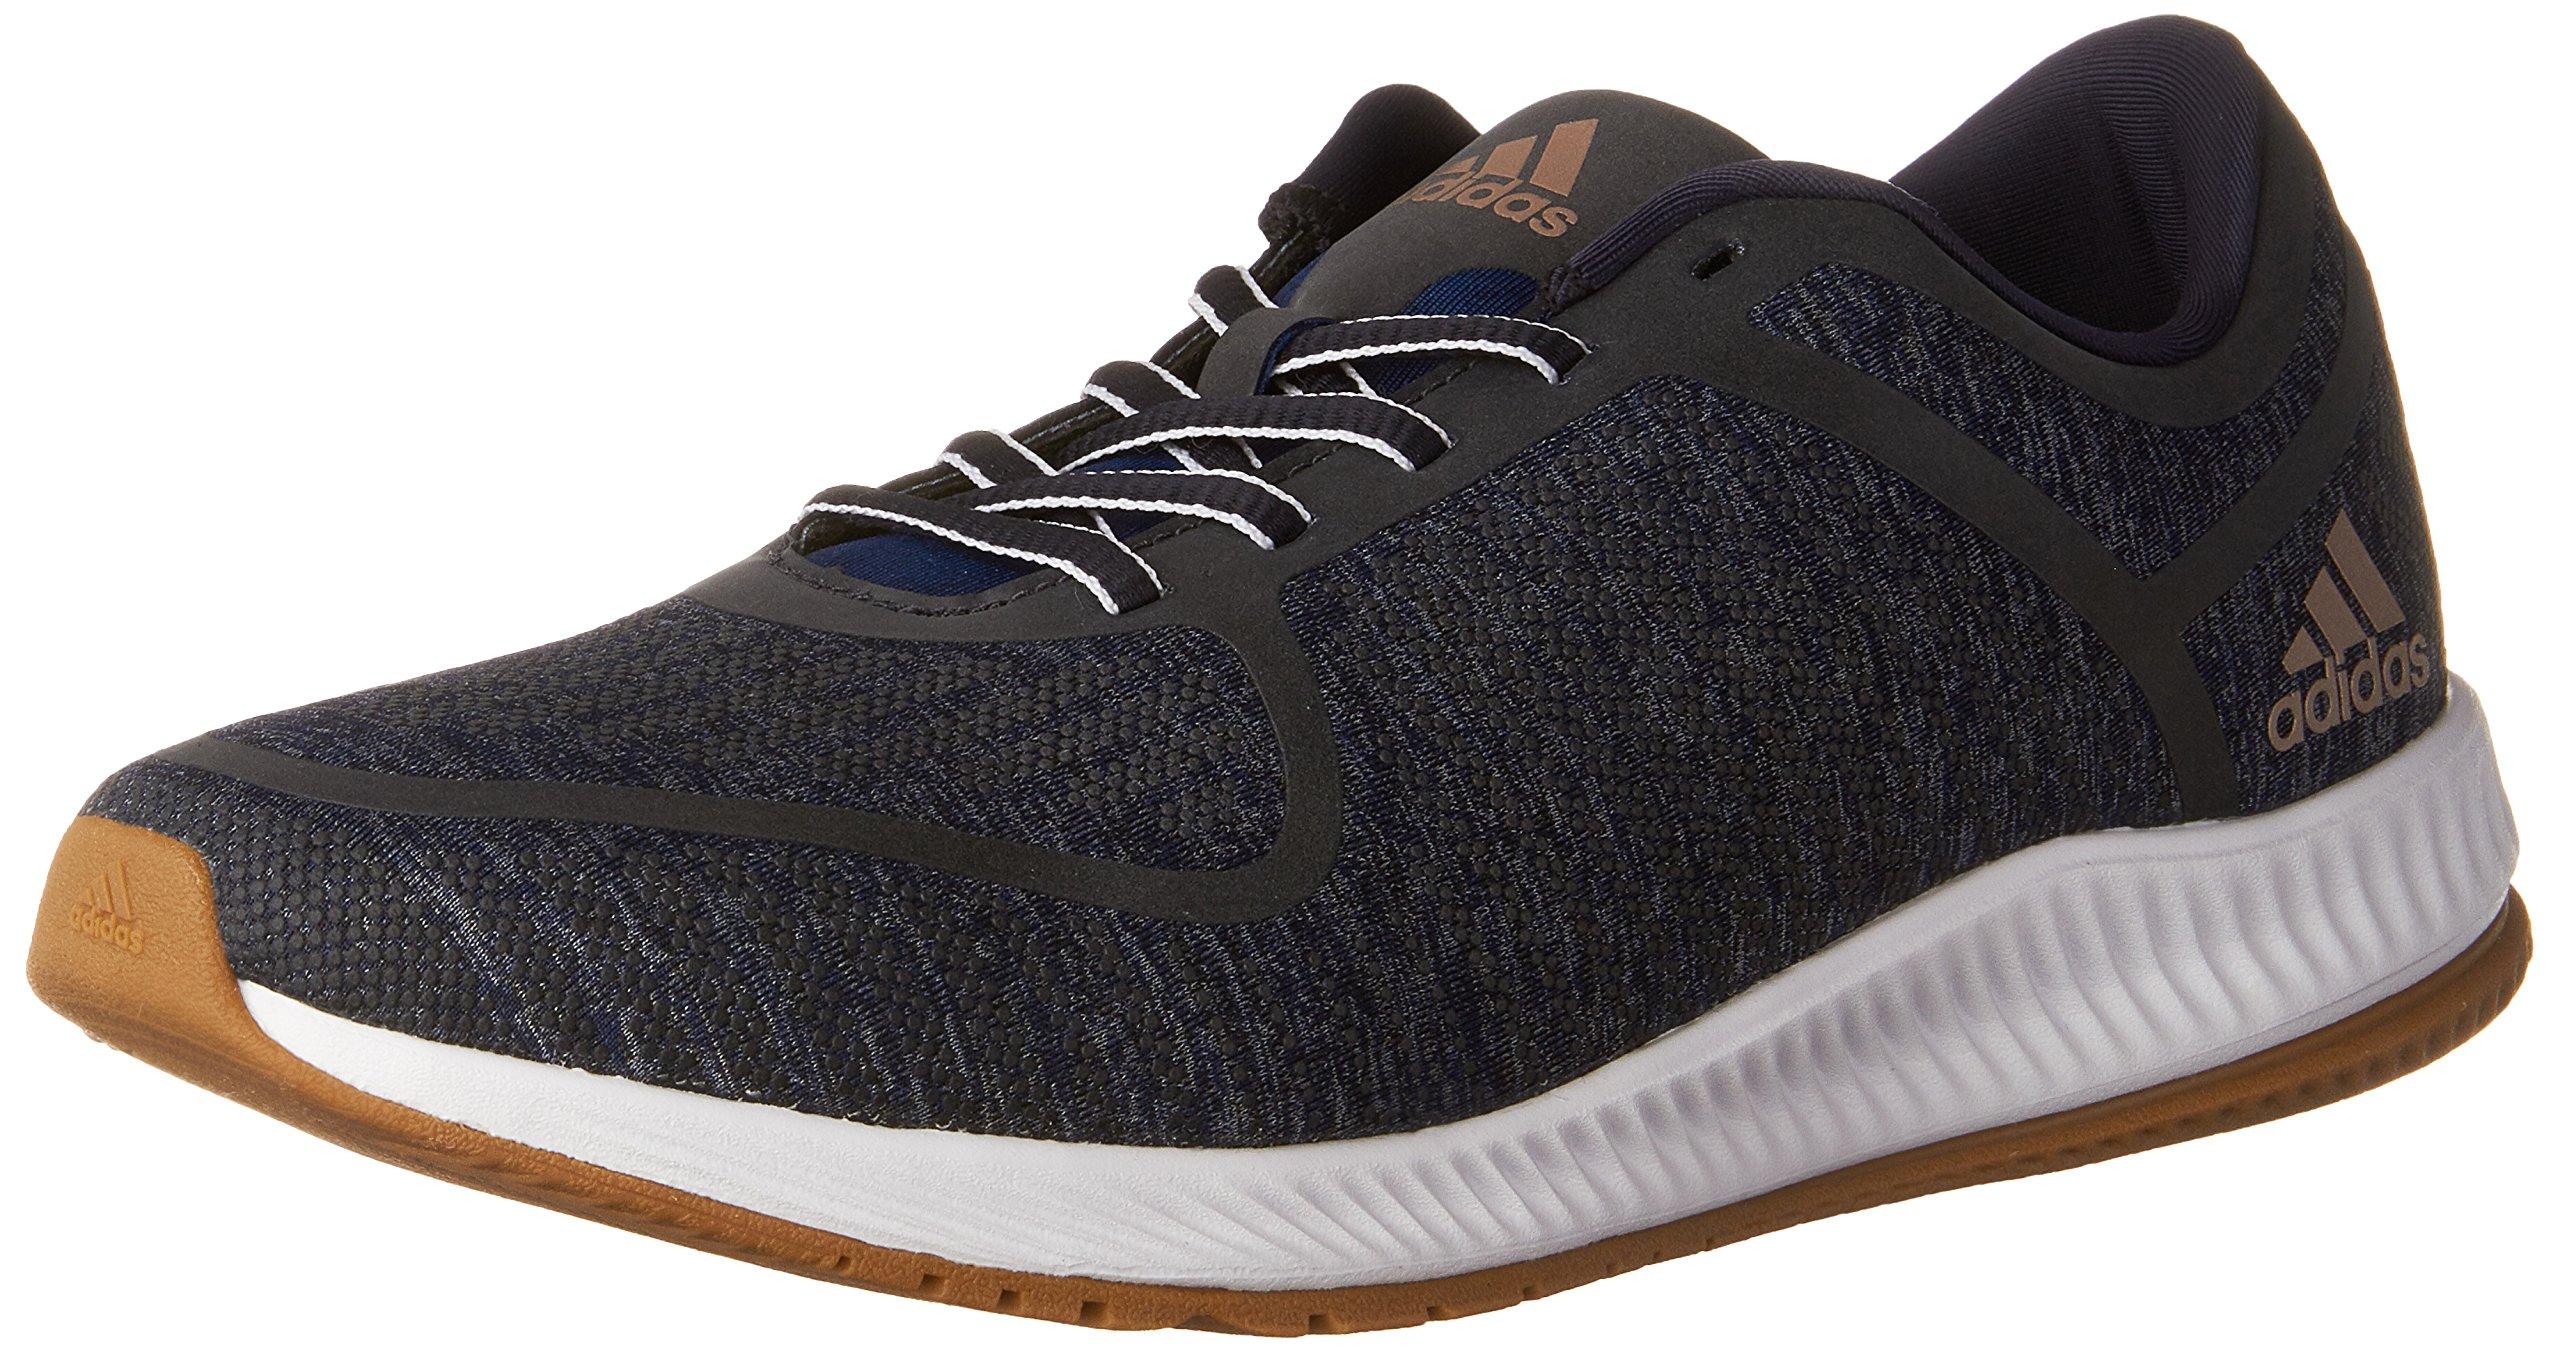 adidas Women's Shoes | Athletics Bounce Cross-Trainer, Collegiate Navy/Vapour Grey/Dark Navy, (9 M US)